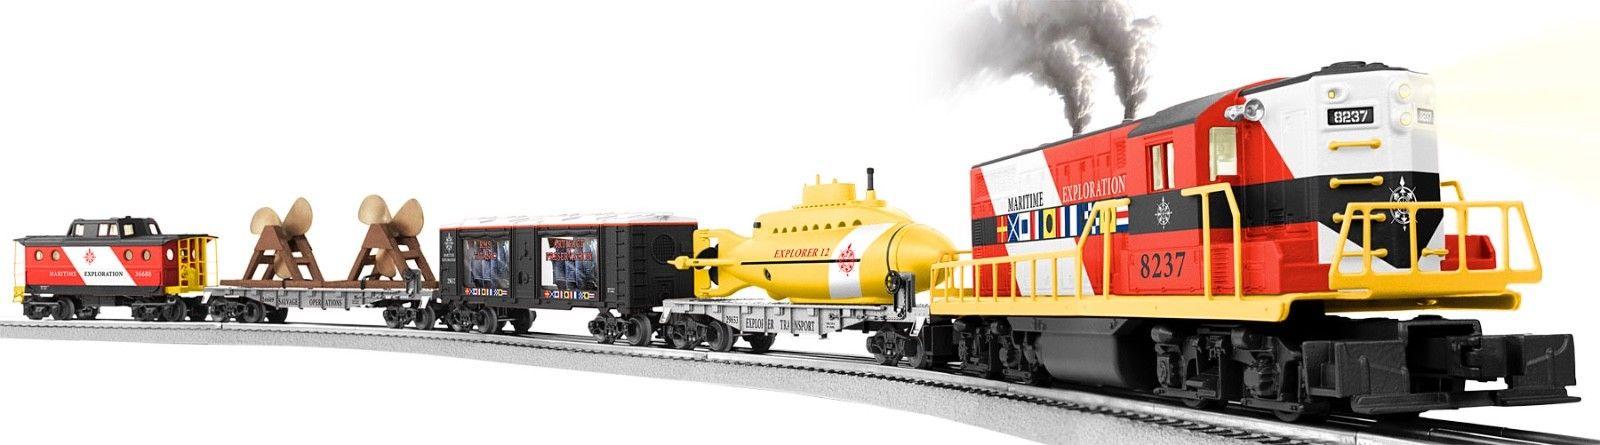 Lionel 30187 Maritime exploration Titanic centennial set ready to run new in sea